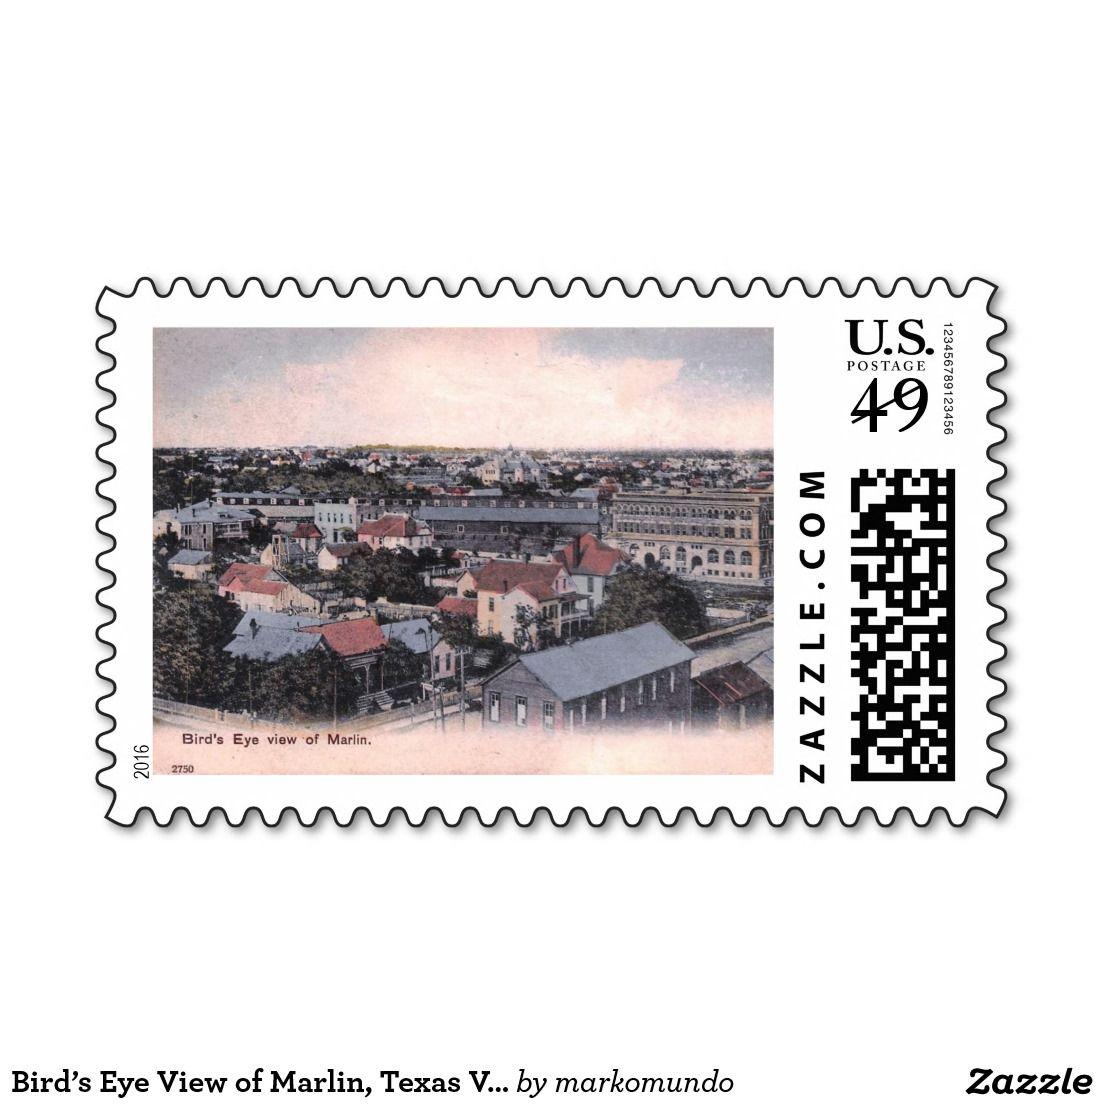 Bird's Eye View of Marlin, Texas Vintage Stamp